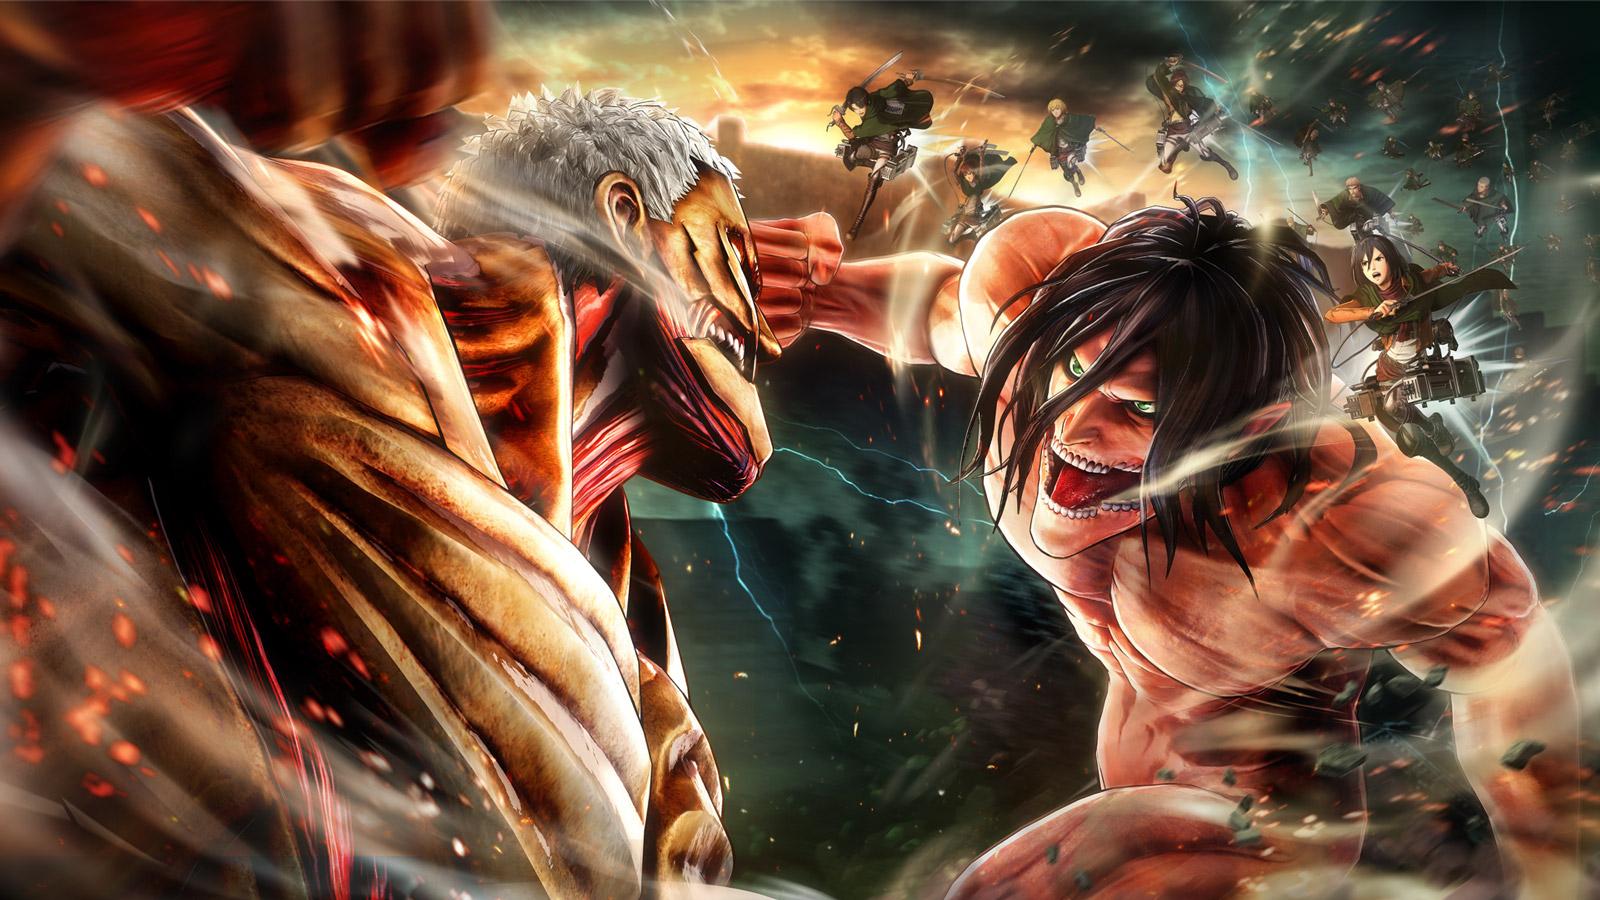 Free Attack on Titan 2 Wallpaper in 1600x900